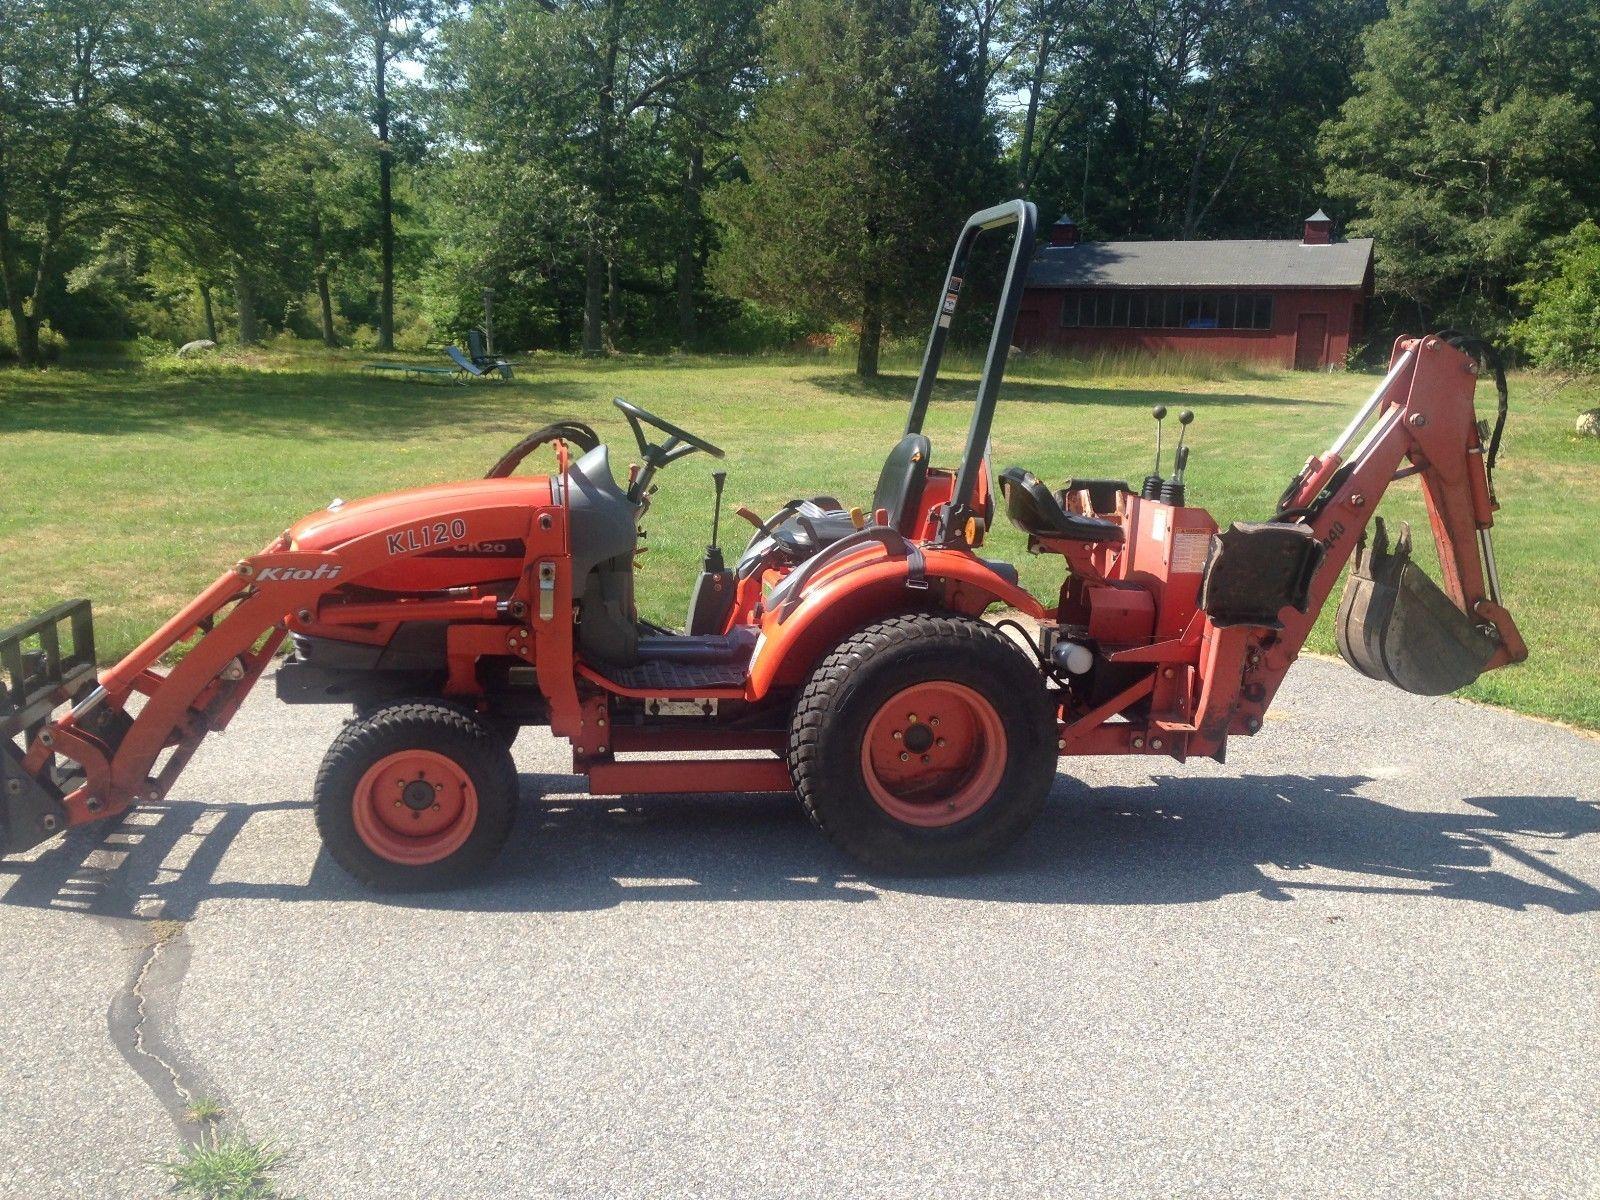 Pin by Bbeeaarr123 on kioti tractors | Tractors, Backhoe loader